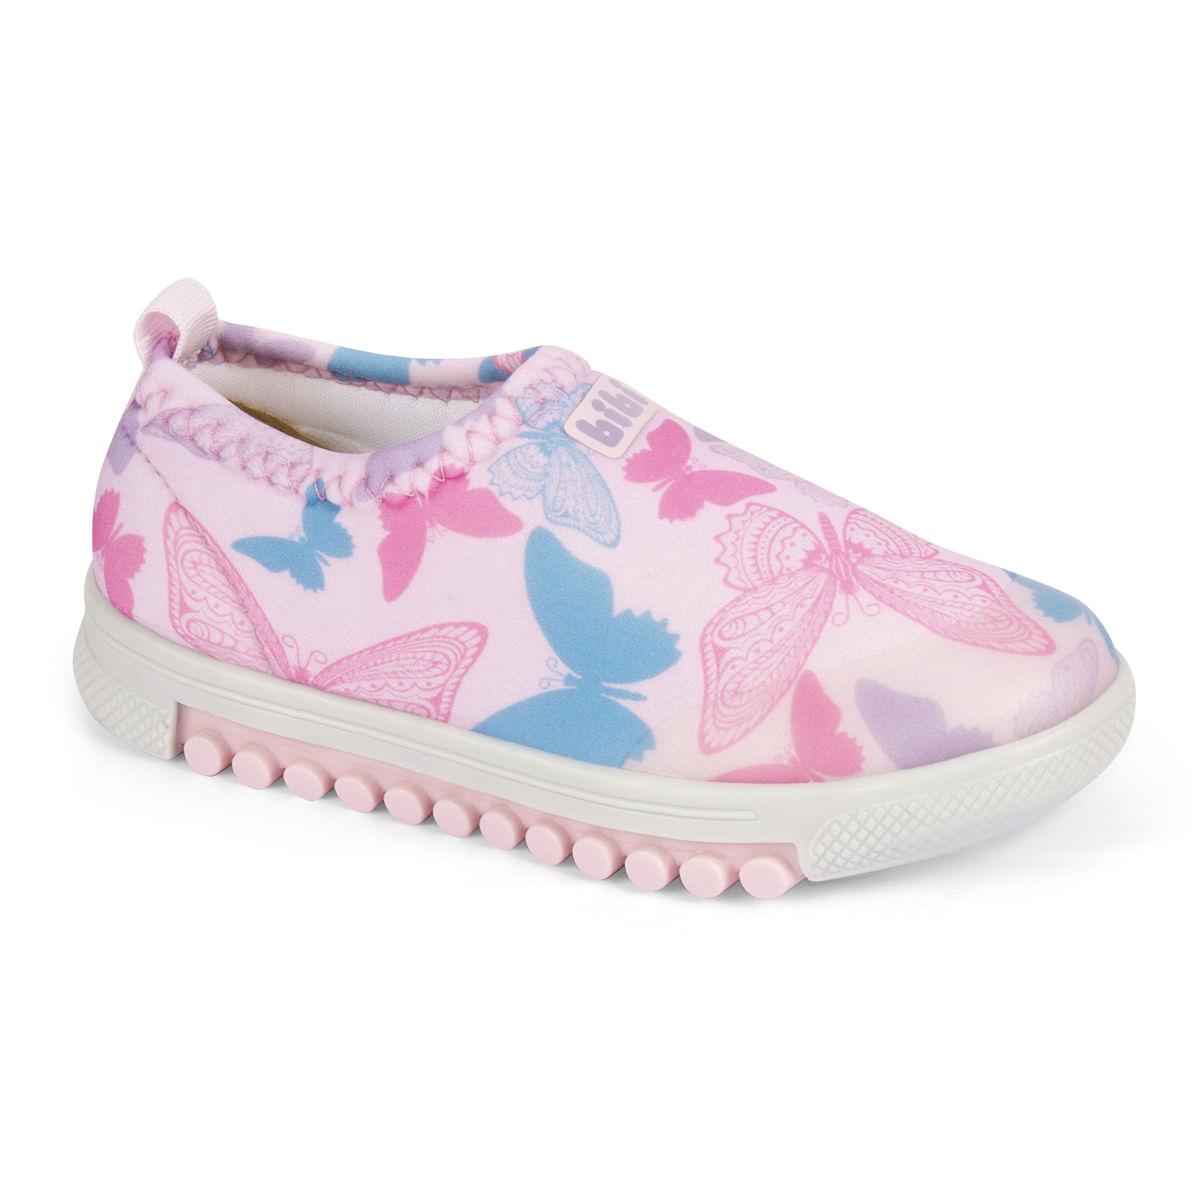 Tênis Infantil Feminino Bibi Rosa Roller New 679456 - Bibi Calçados d0feeaa8ad01d